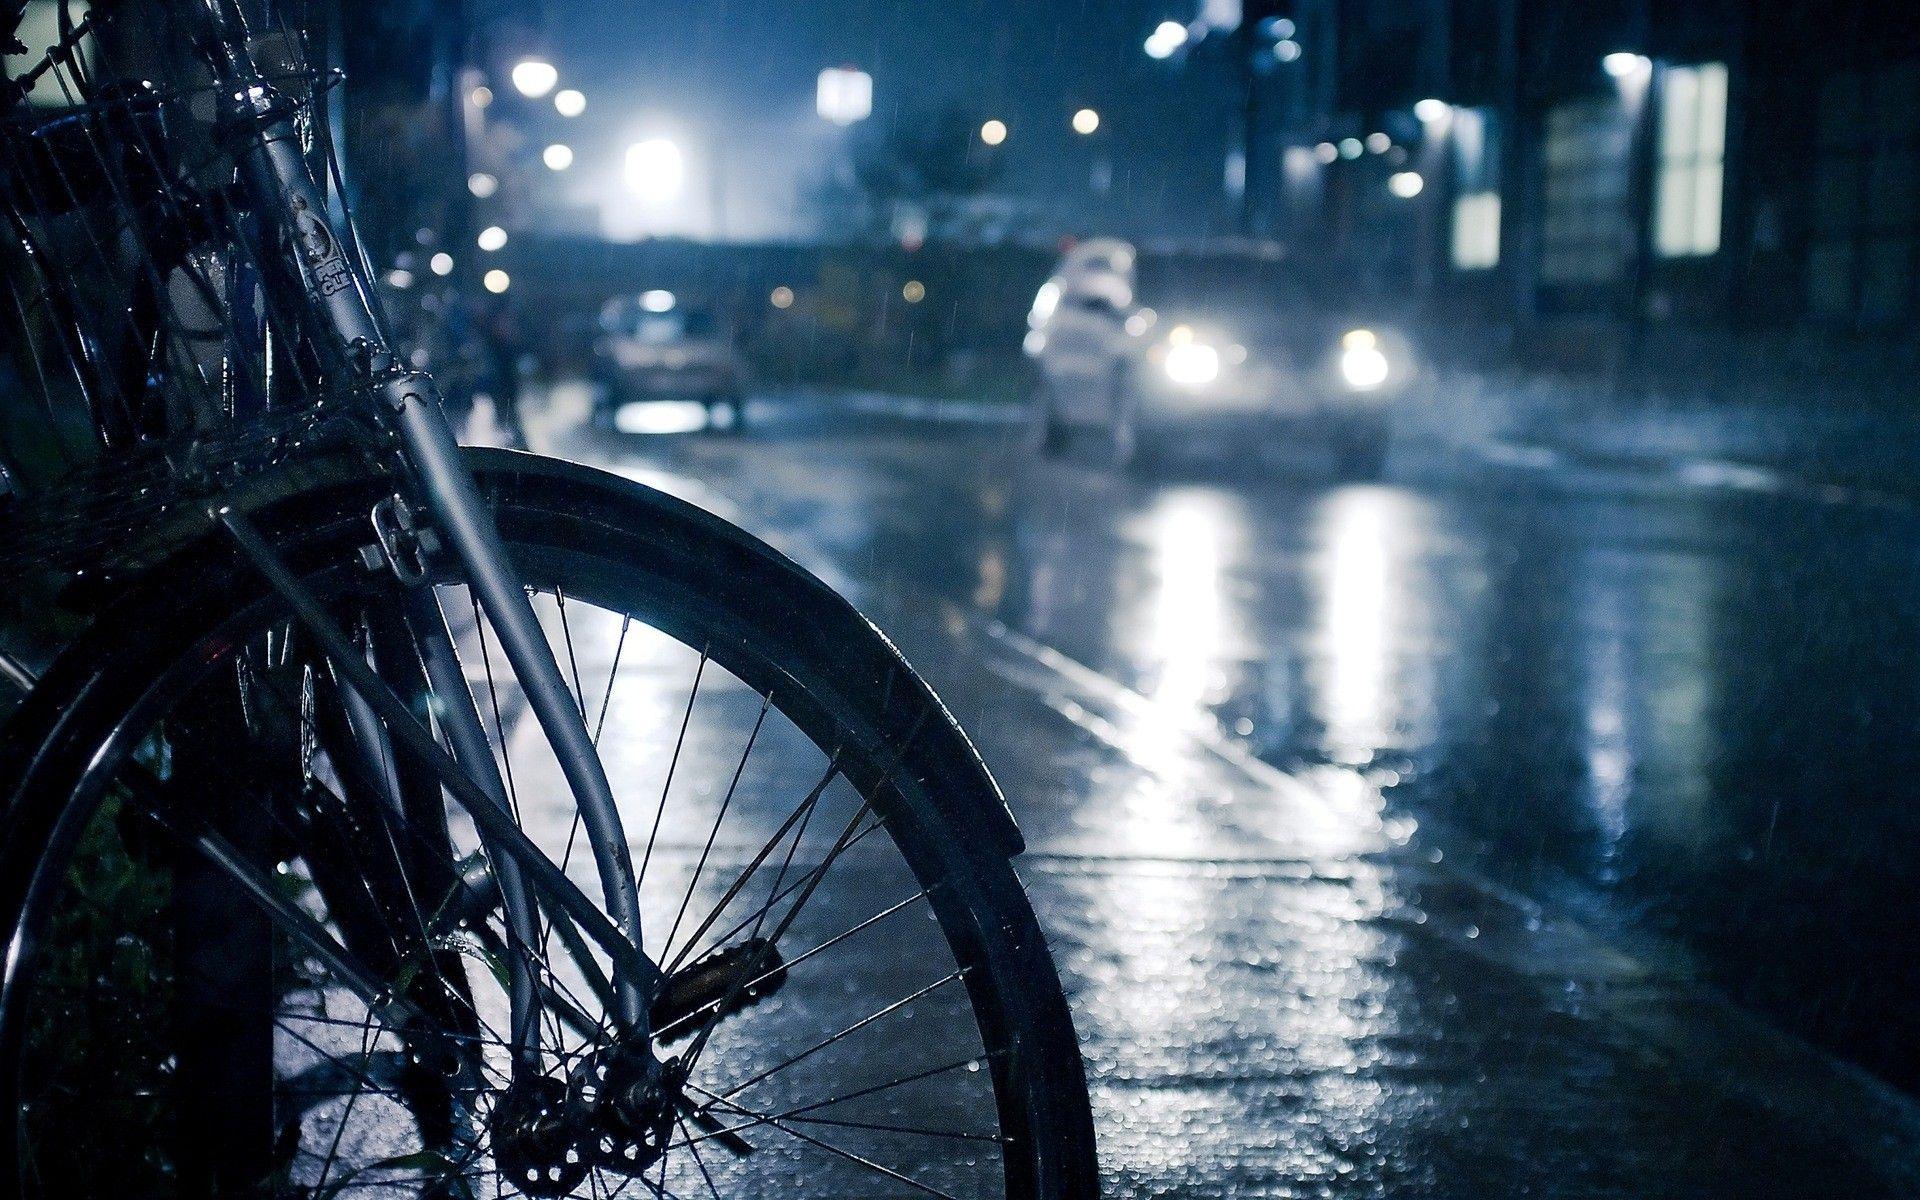 Hd wallpaper rain - Rainy Day And Bicycle Wallpaper Hd Wallpaper Wallpaperlepi